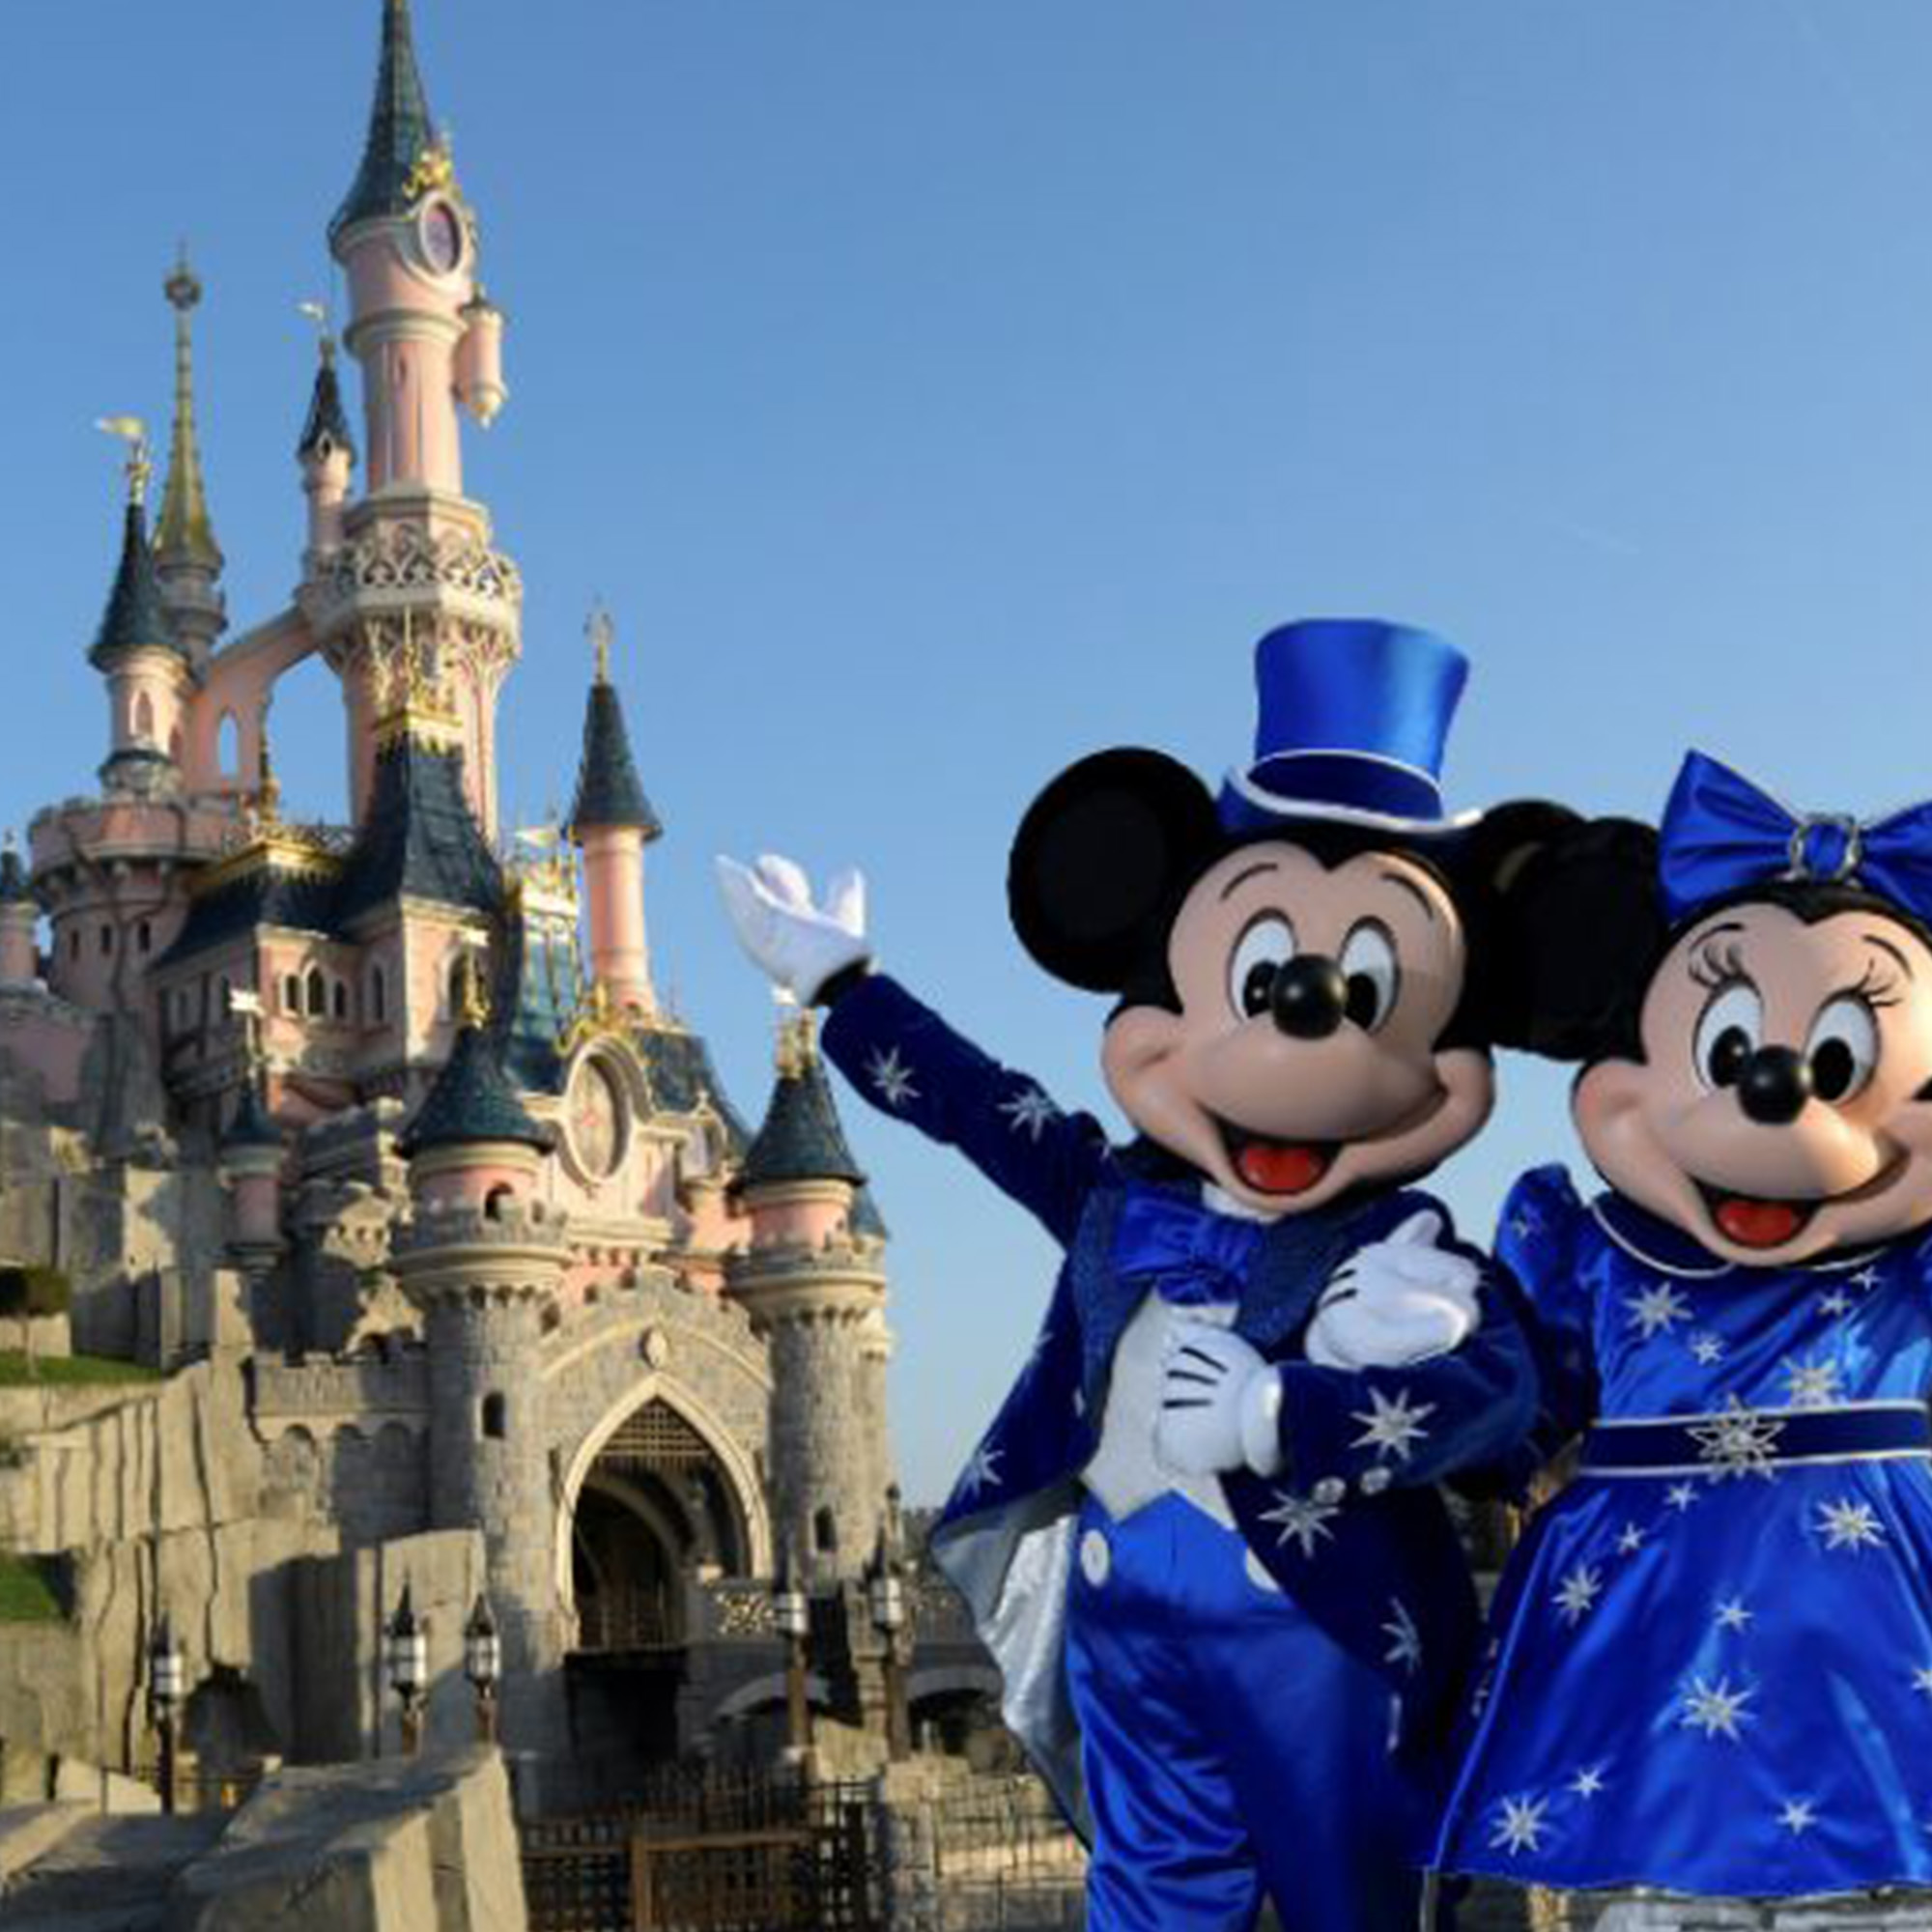 gîte_saint_germain_oise_versigny_0021_Disneyland Paris (pastille)